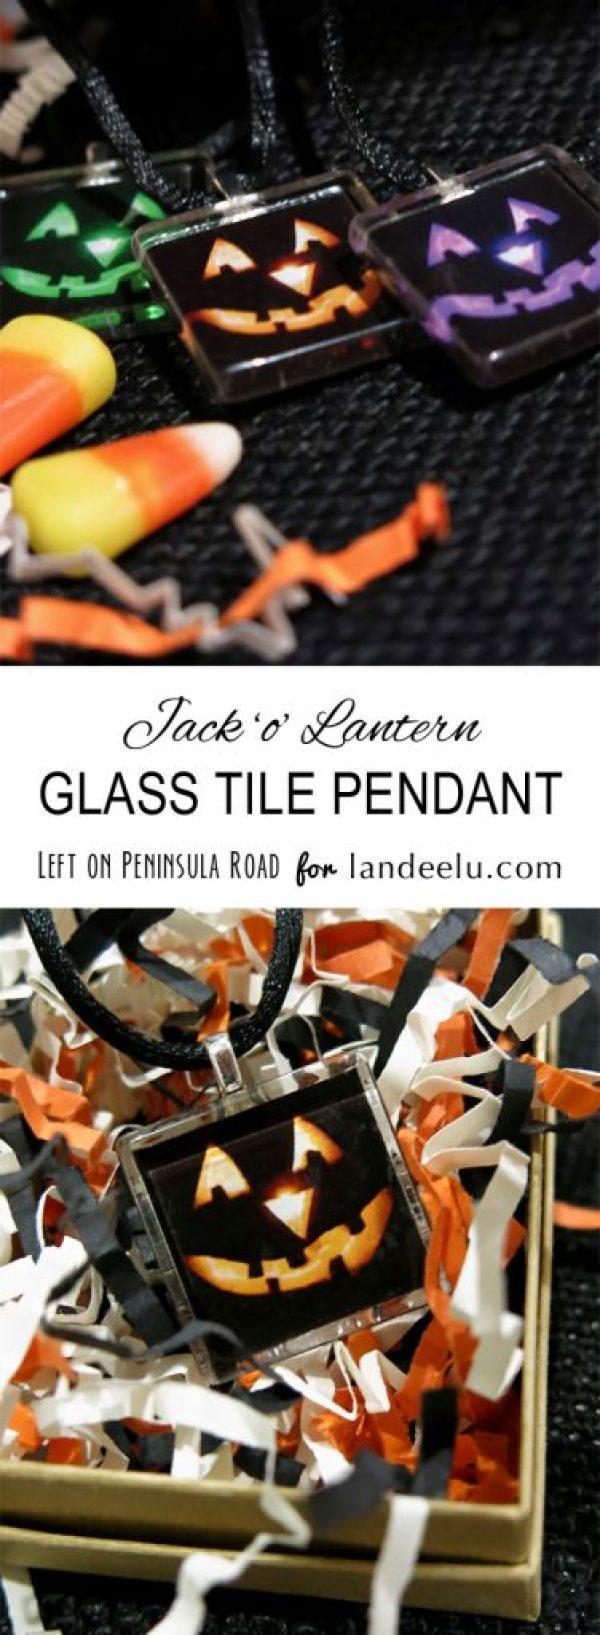 Jack 'o' Lantern Tile Pendant by Left on Peninsula Road for landed.com